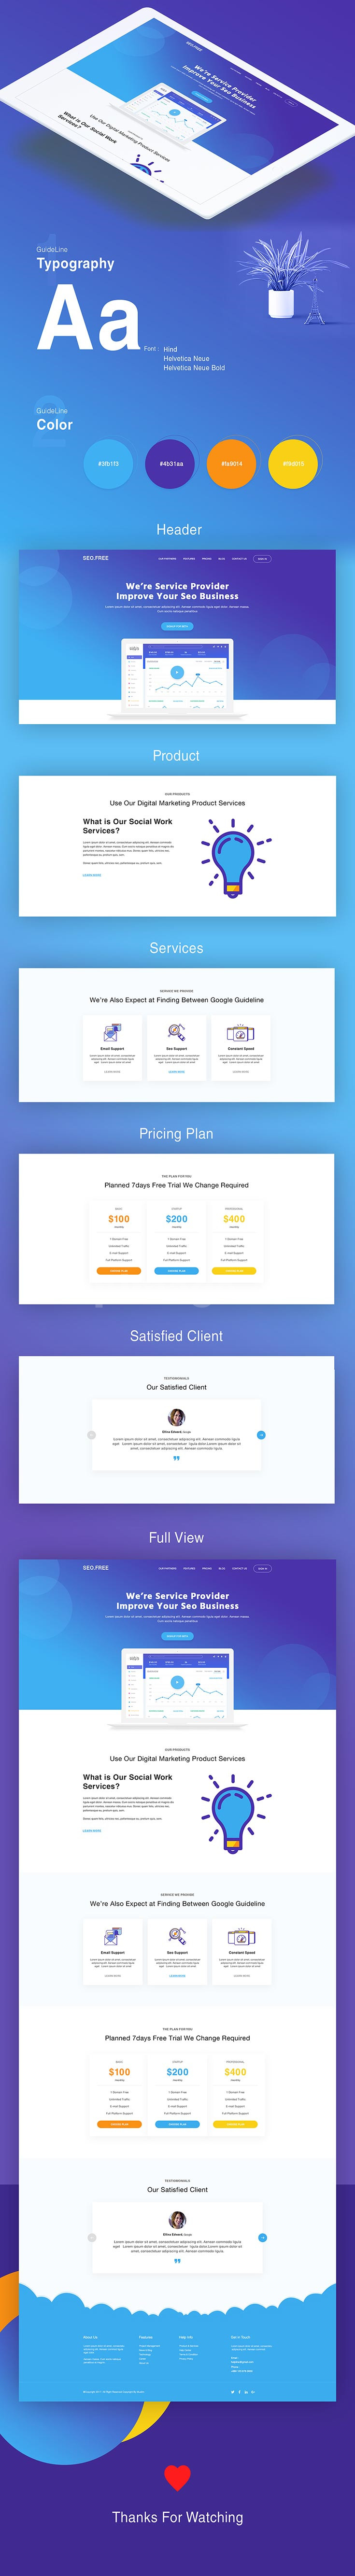 seo宣传单页面web界面网页设计模板源文件ui flat design psd模板下载